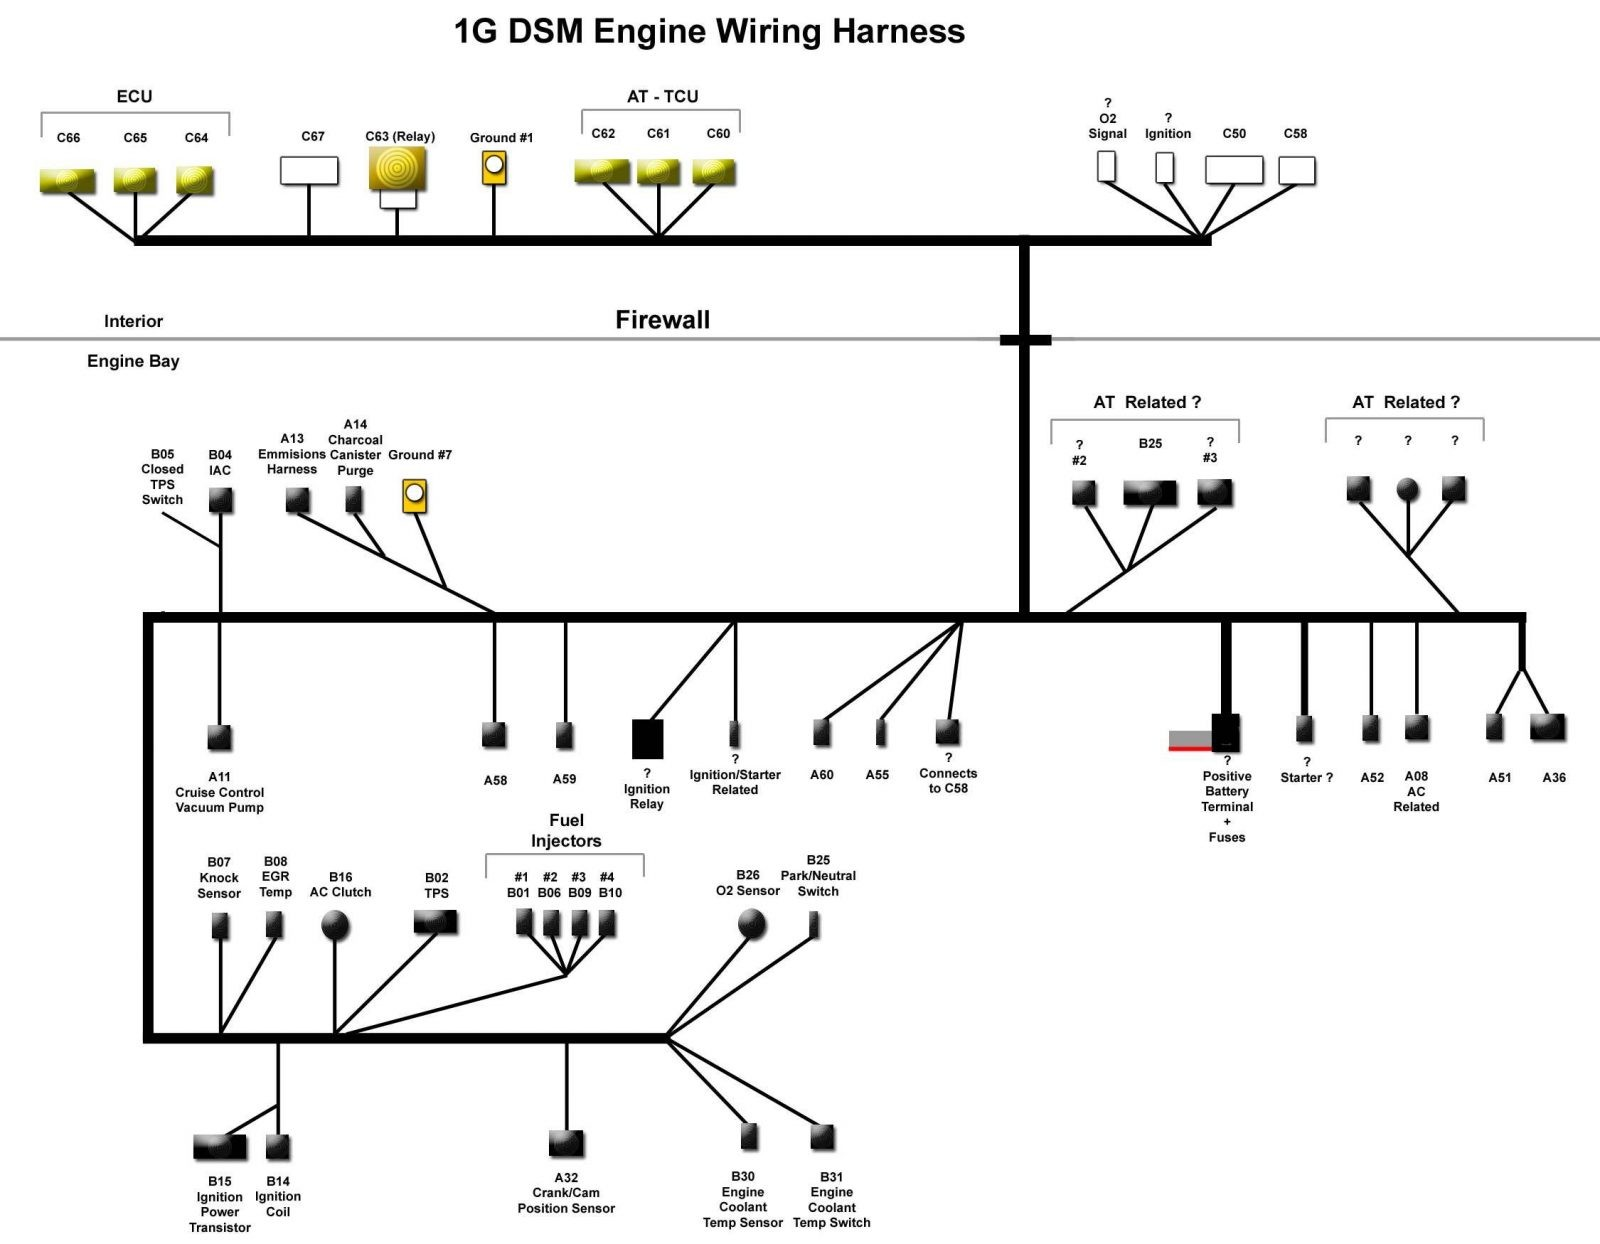 Delco Alternator Wiring Diagram Diagram Delco Remy Wire Alternator Wiring Vw Externalor for 3 Wires Of Delco Alternator Wiring Diagram